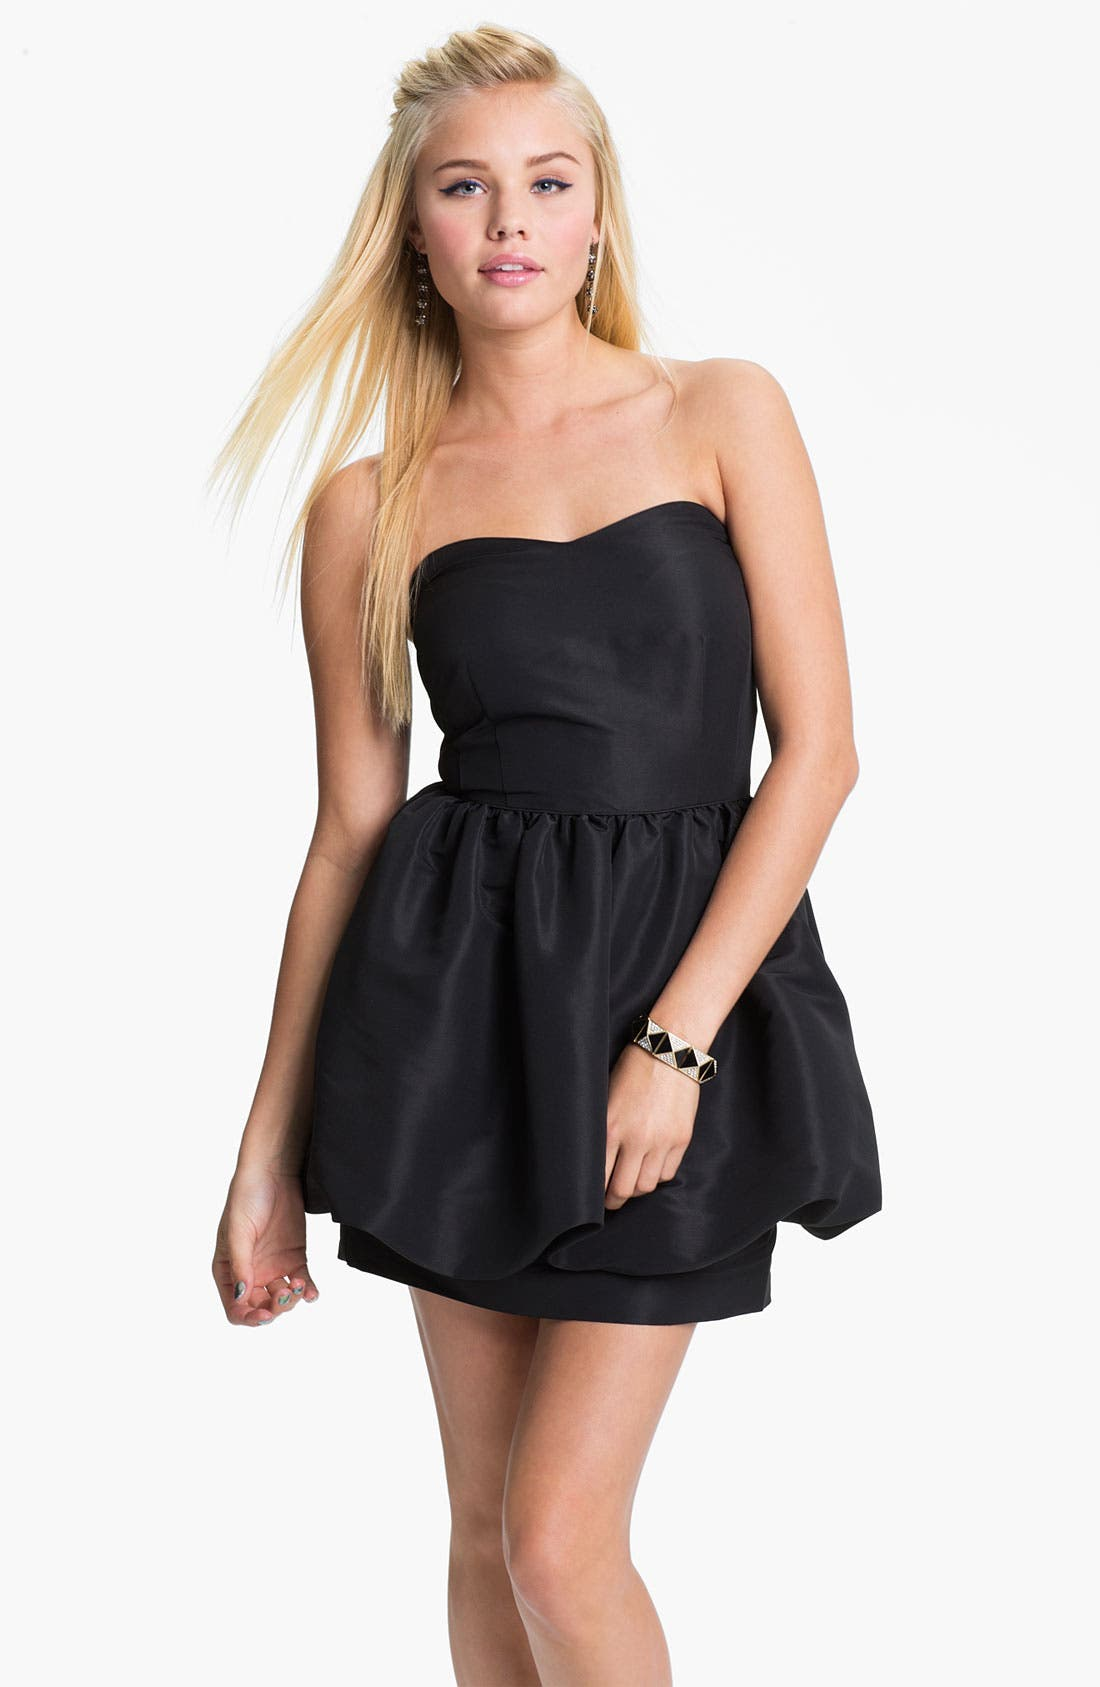 Alternate Image 1 Selected - Original Frenchi Bubble Strapless Dress (Juniors)